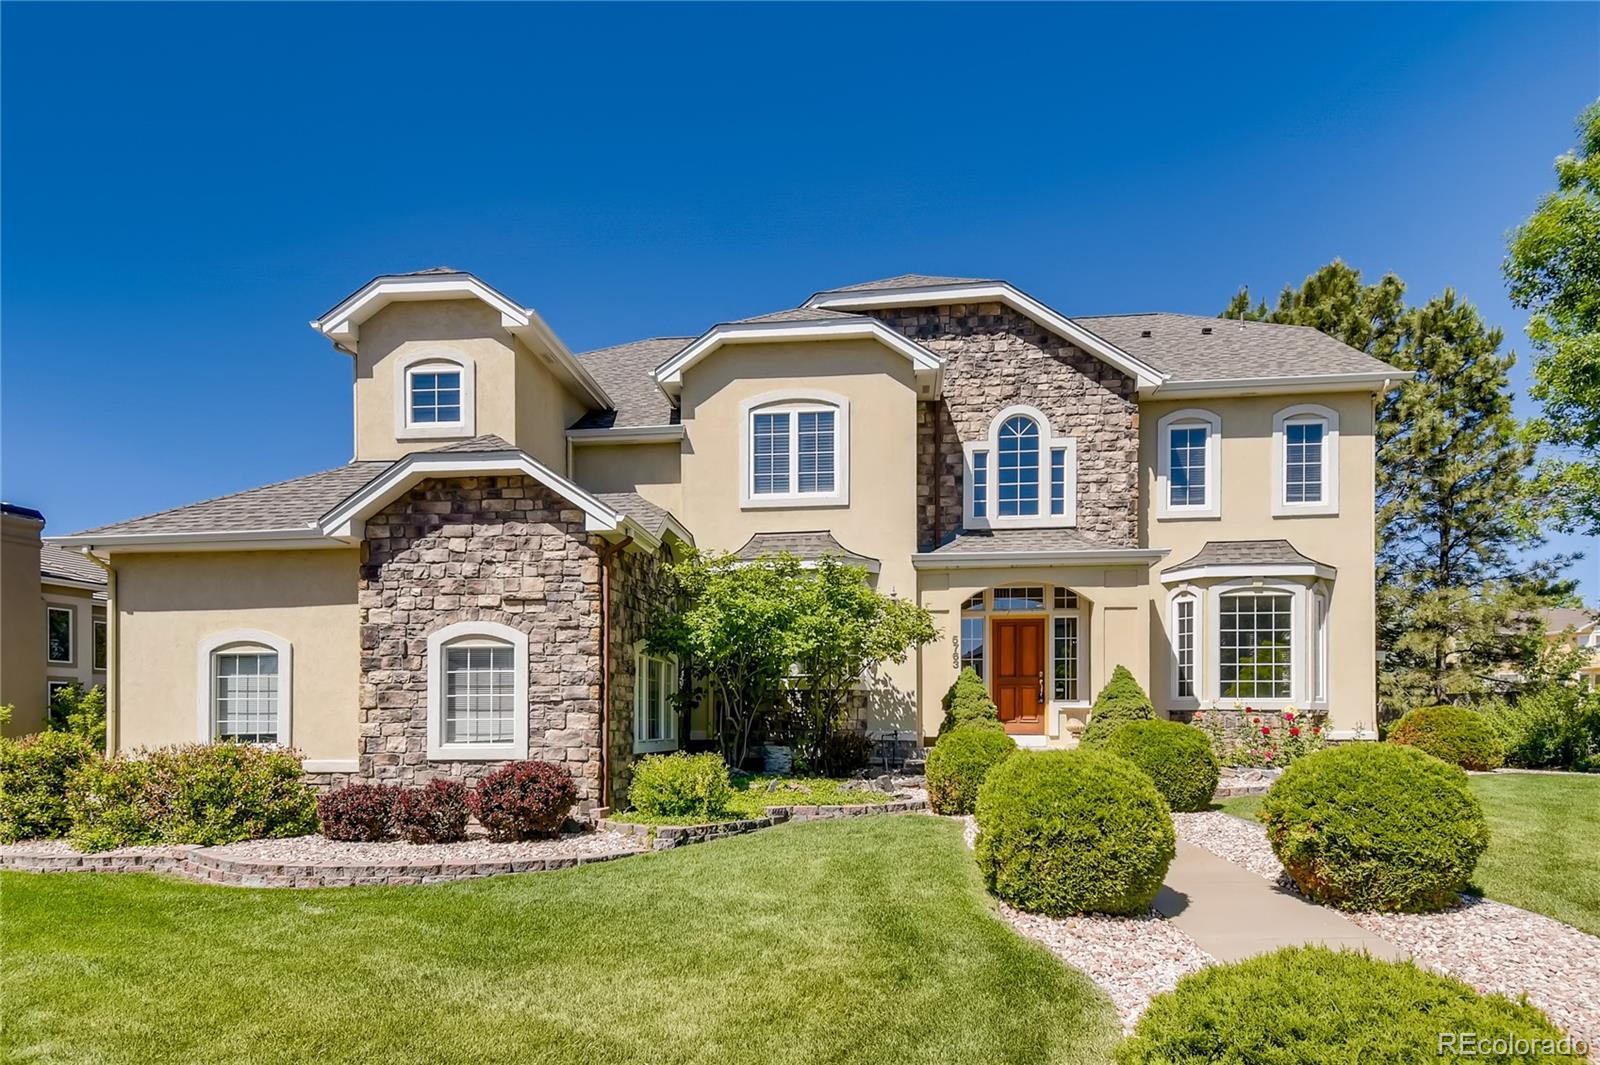 5763 S Benton Way Property Photo - Littleton, CO real estate listing